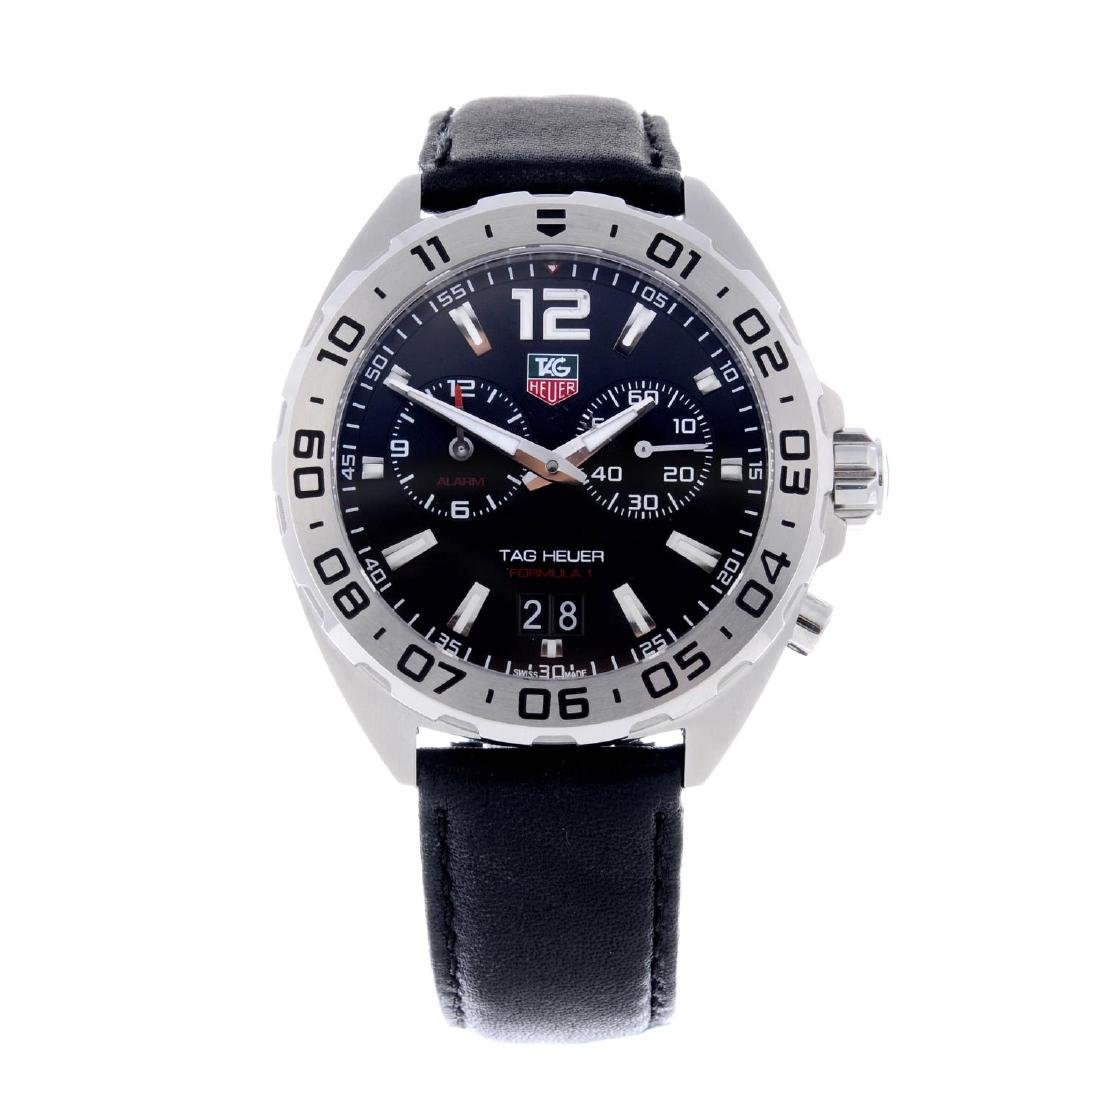 TAG HEUER - a gentleman's Formula 1 Alarm wrist watch.